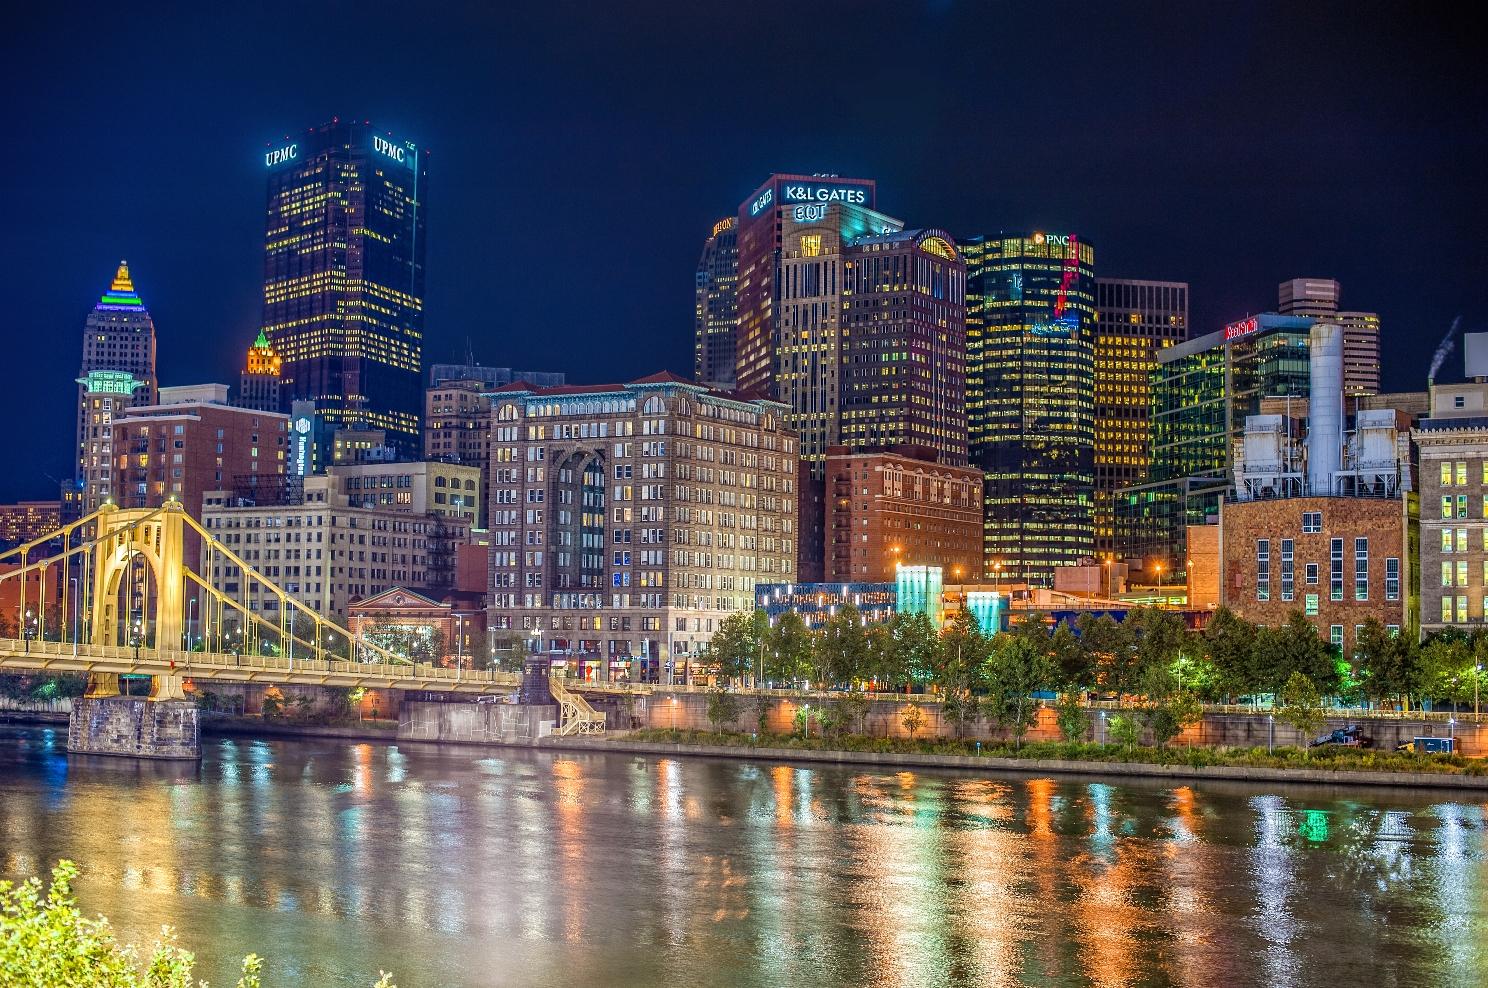 Pittsburgh Desktop Wallpaper Skyline: PNC Park Desktop Wallpaper